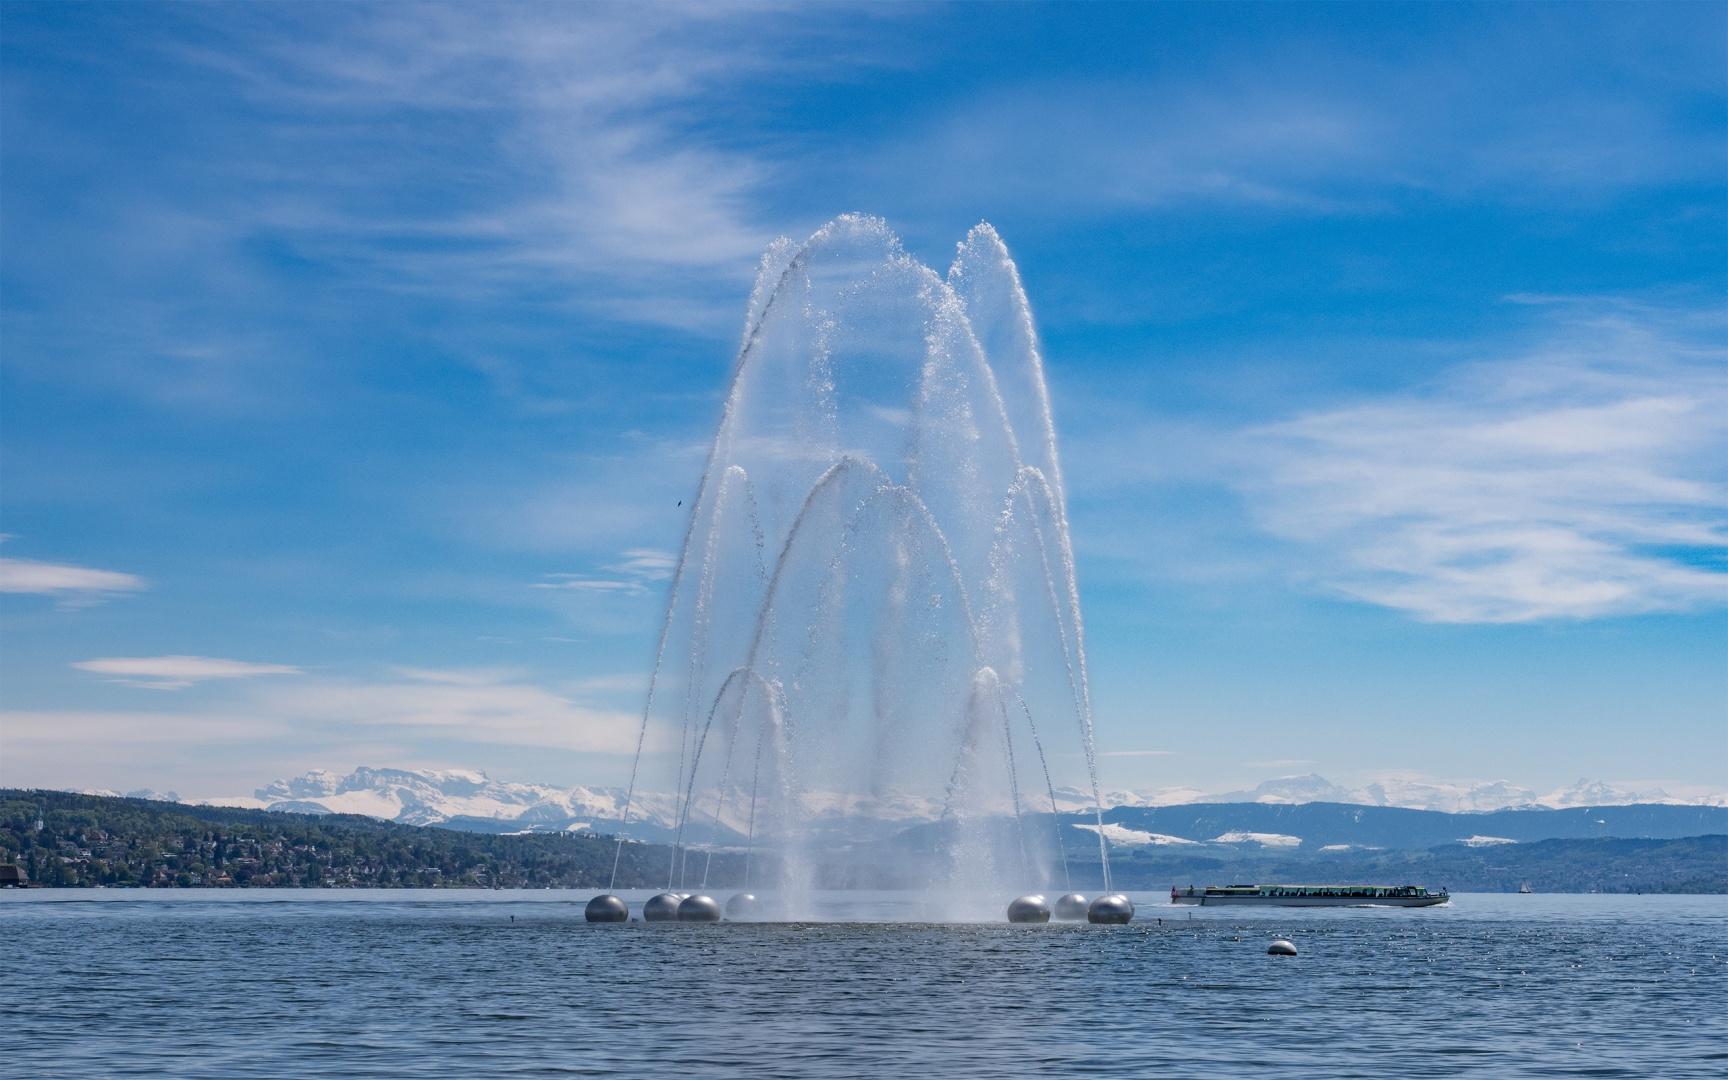 Wasserspiel Aquaretum mit Blick auf Berge © Gian Paul Lozza